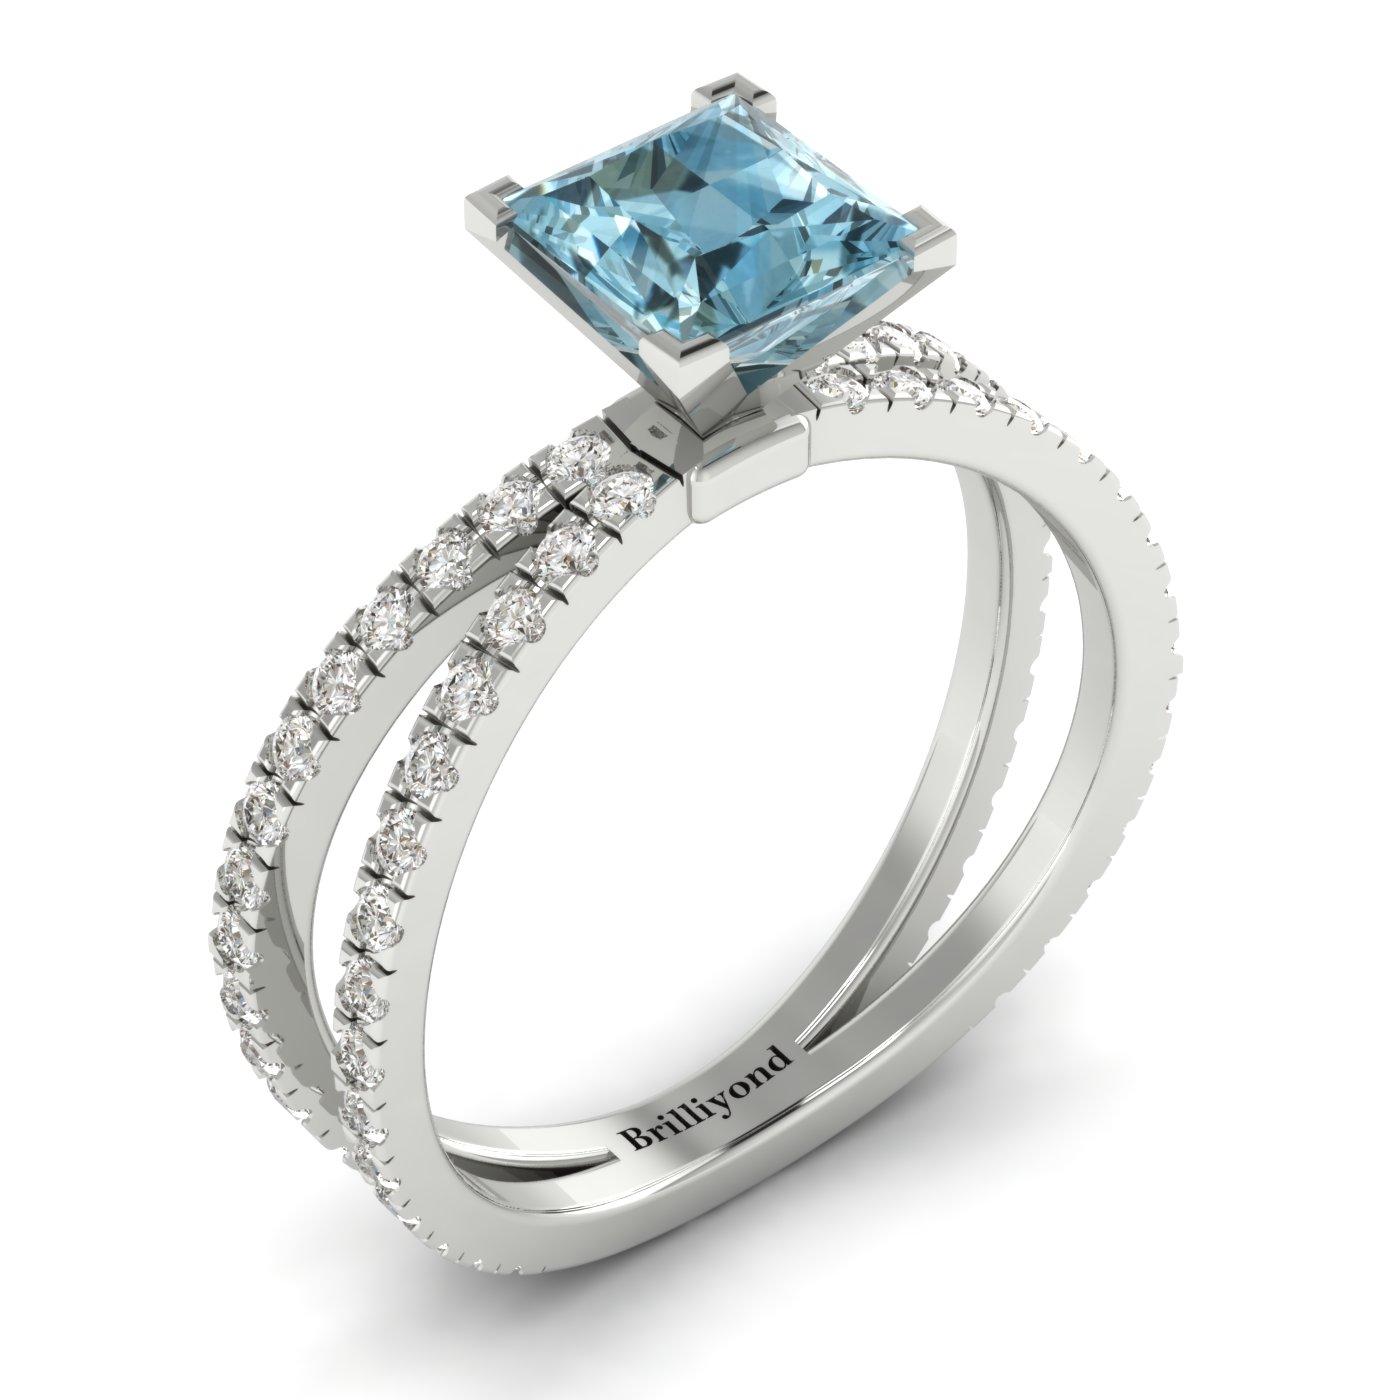 Aquamarine White Gold Princess Cut Engagement Ring Florentine_image2